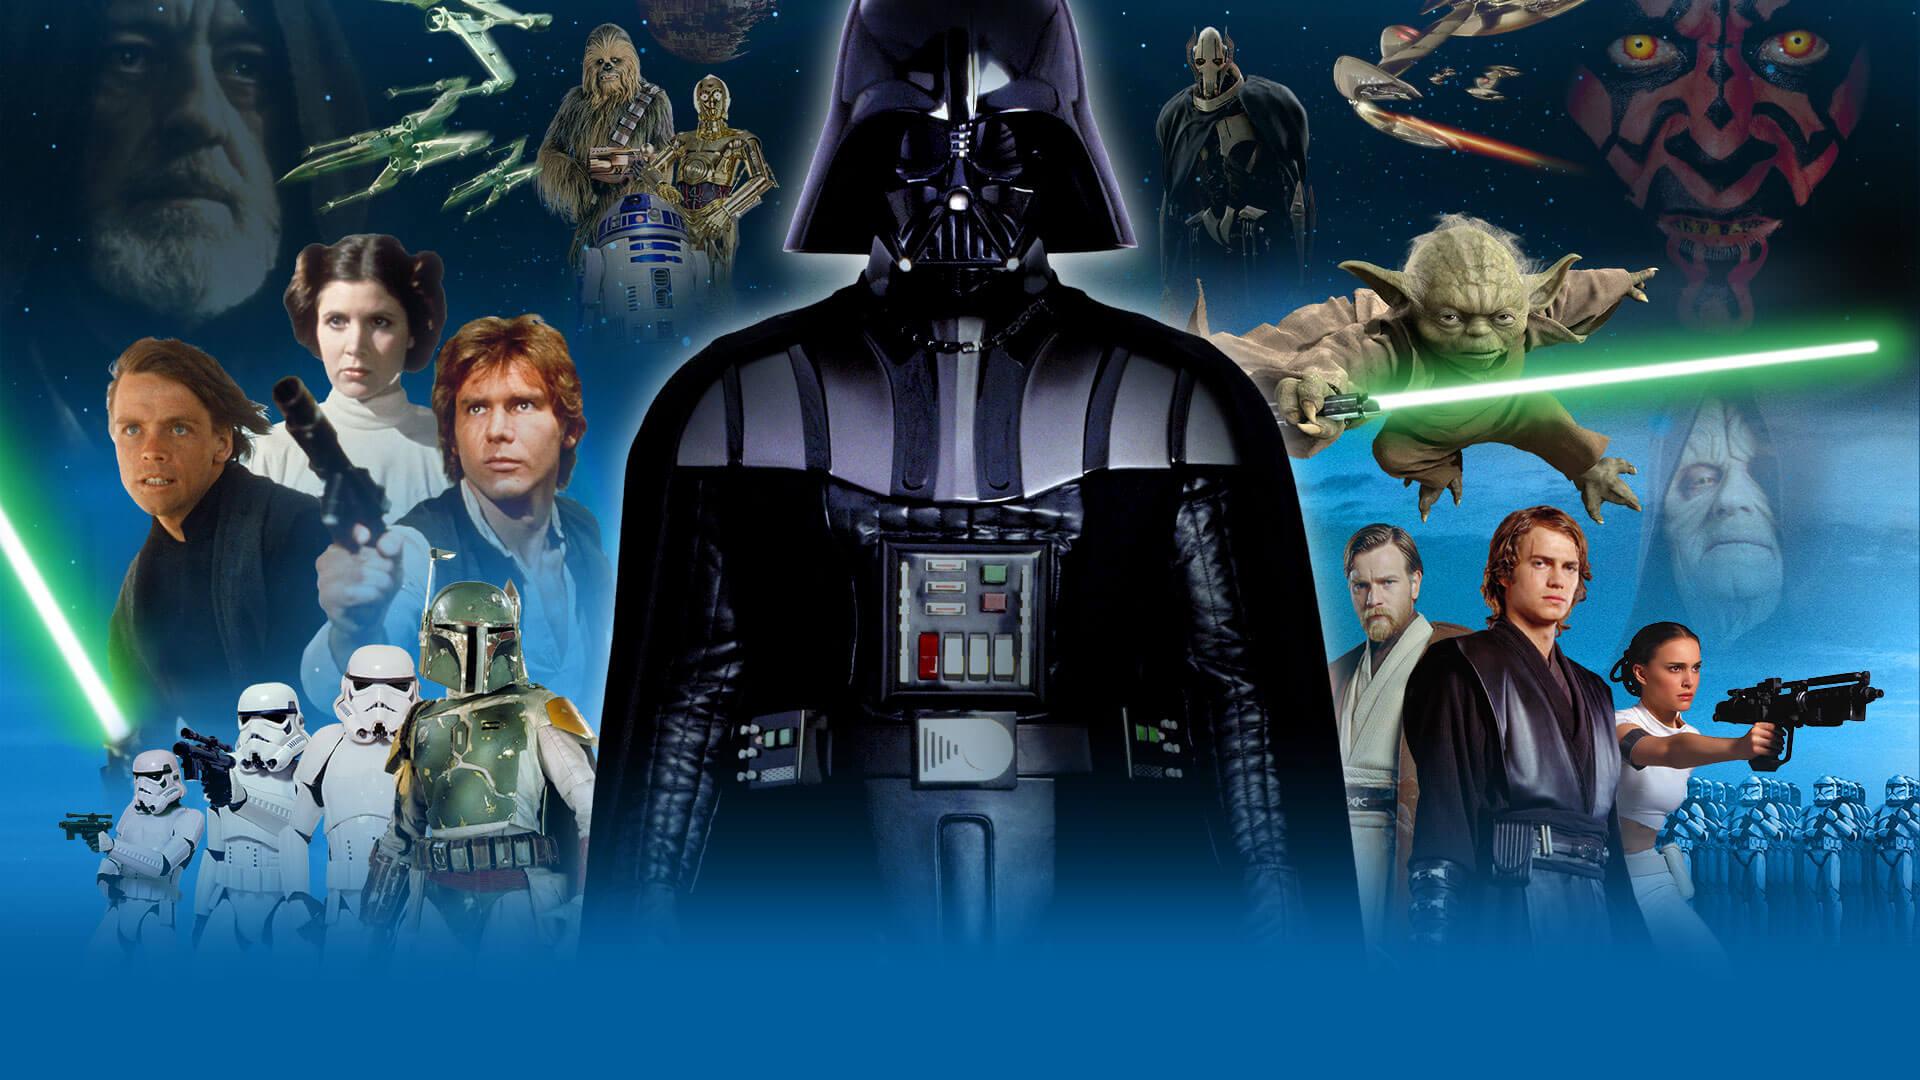 Image Hasbro Star Wars Wallpaper 2015